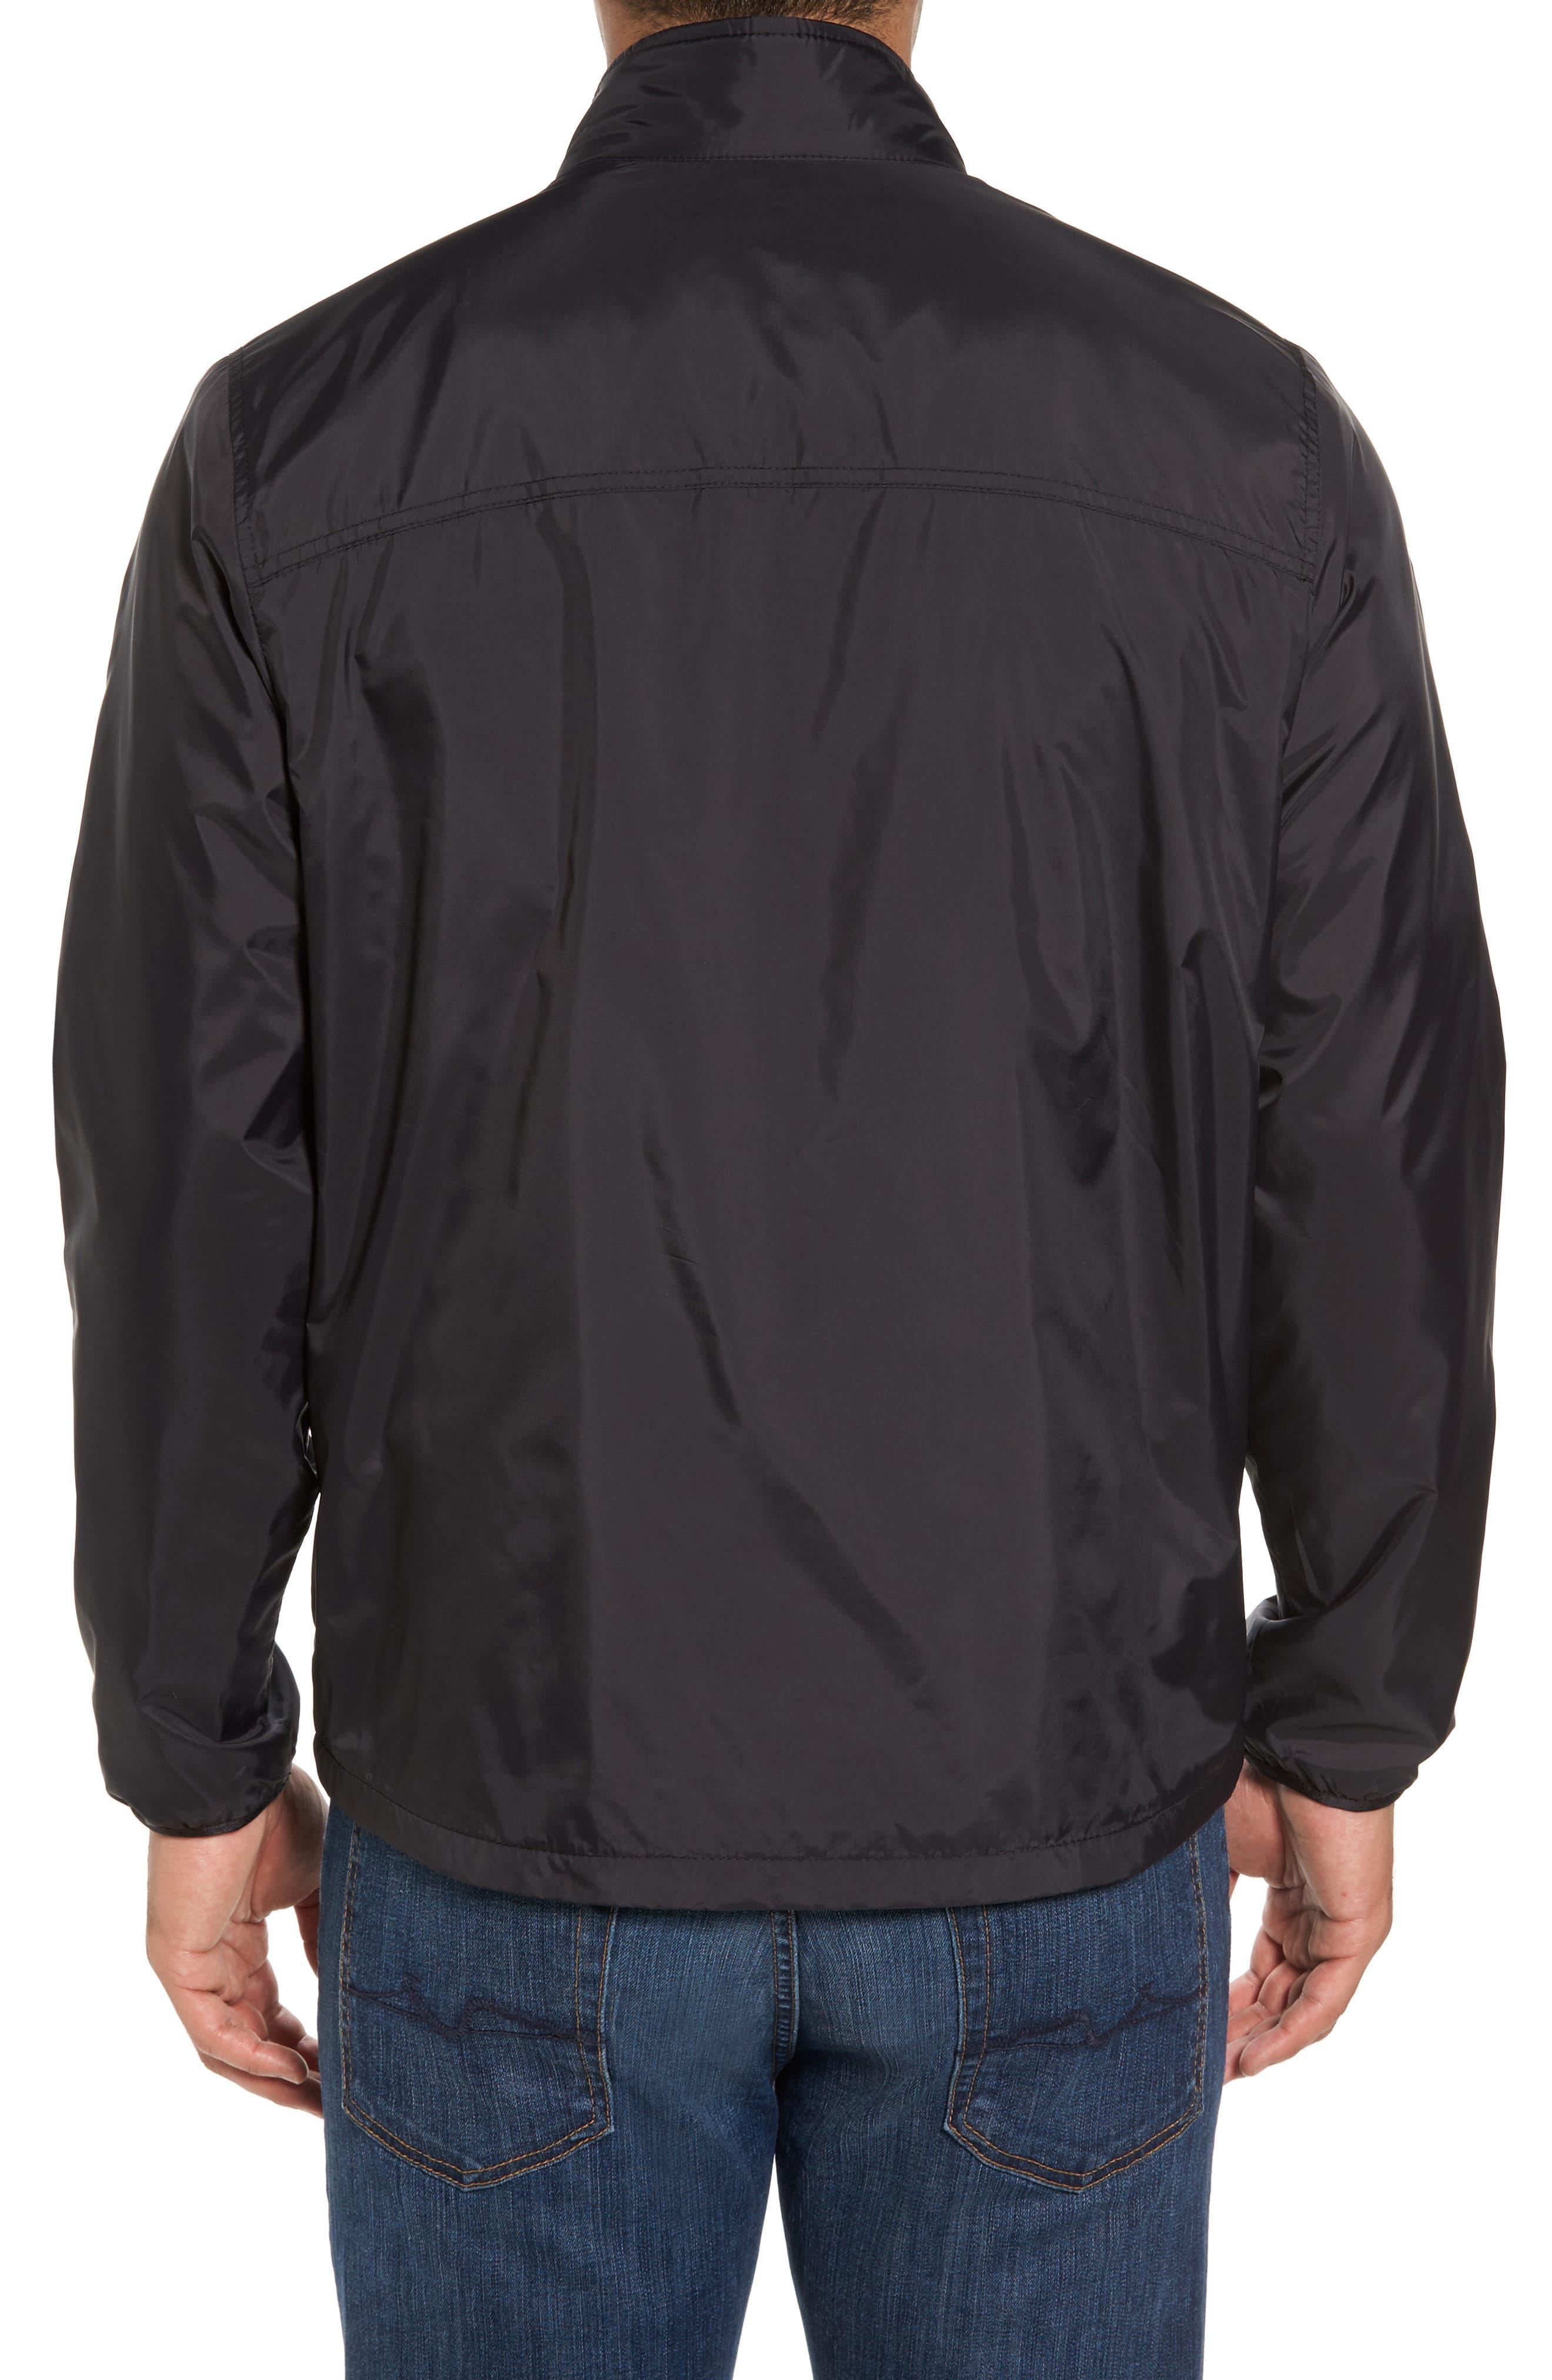 Nine Iron Water-Repellent Jacket,                             Alternate thumbnail 2, color,                             Black